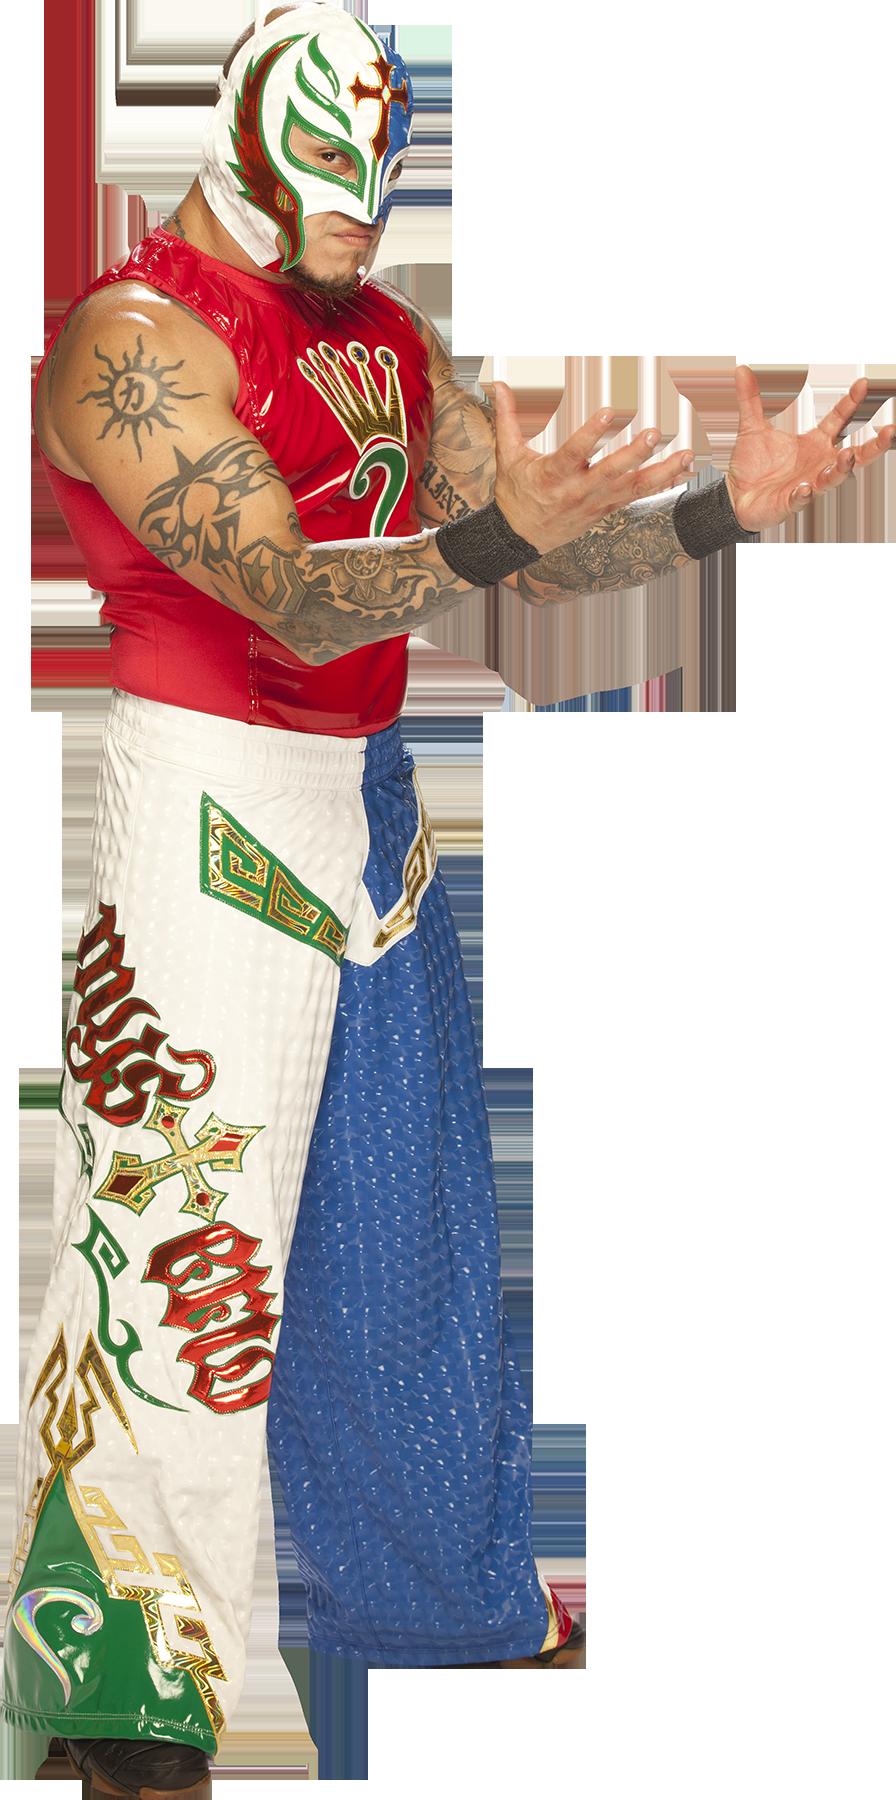 Rey Misterio By Santiagowwe12 On Deviantart Wwe Legends Pro Wrestling Luchador